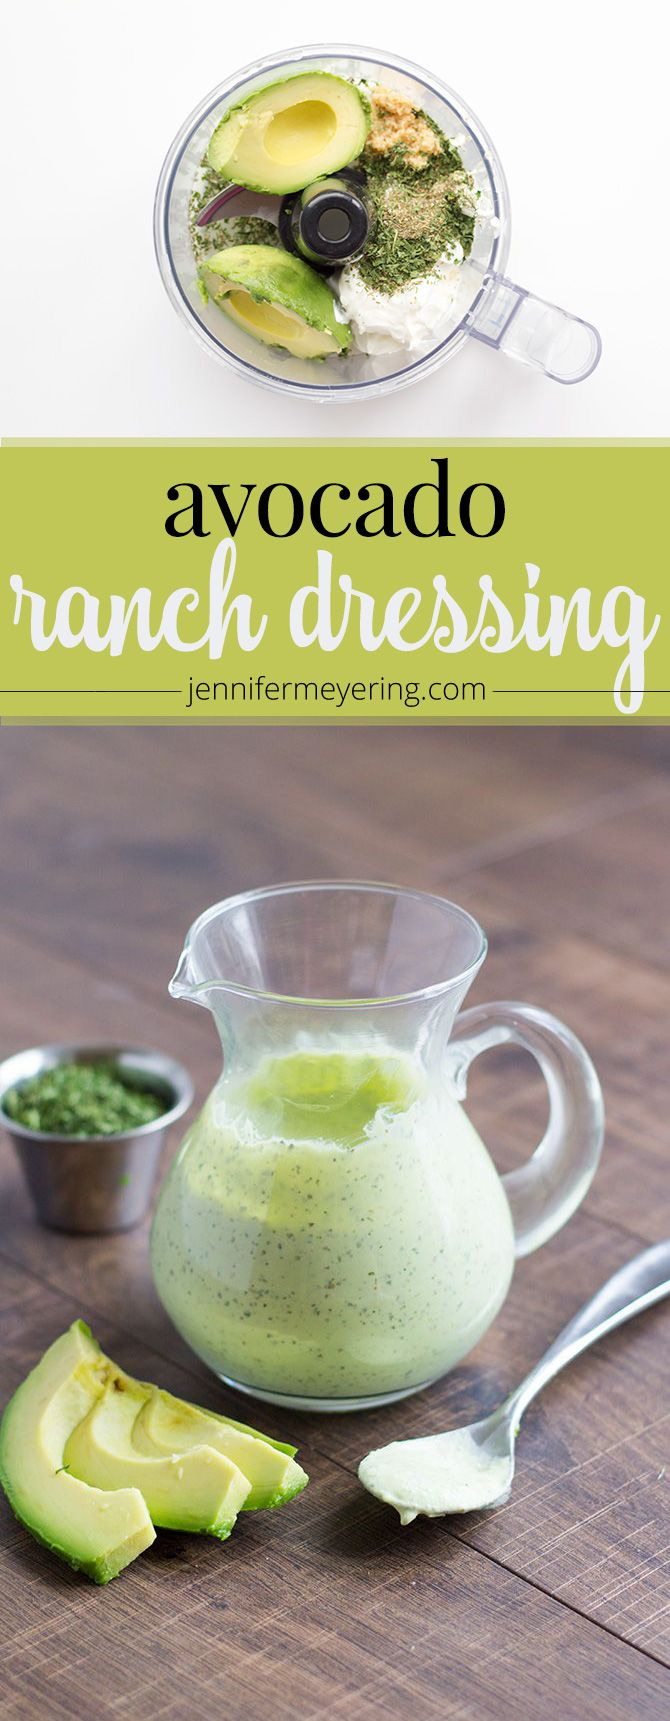 Avocado Ranch Dressing - JenniferMeyering.com